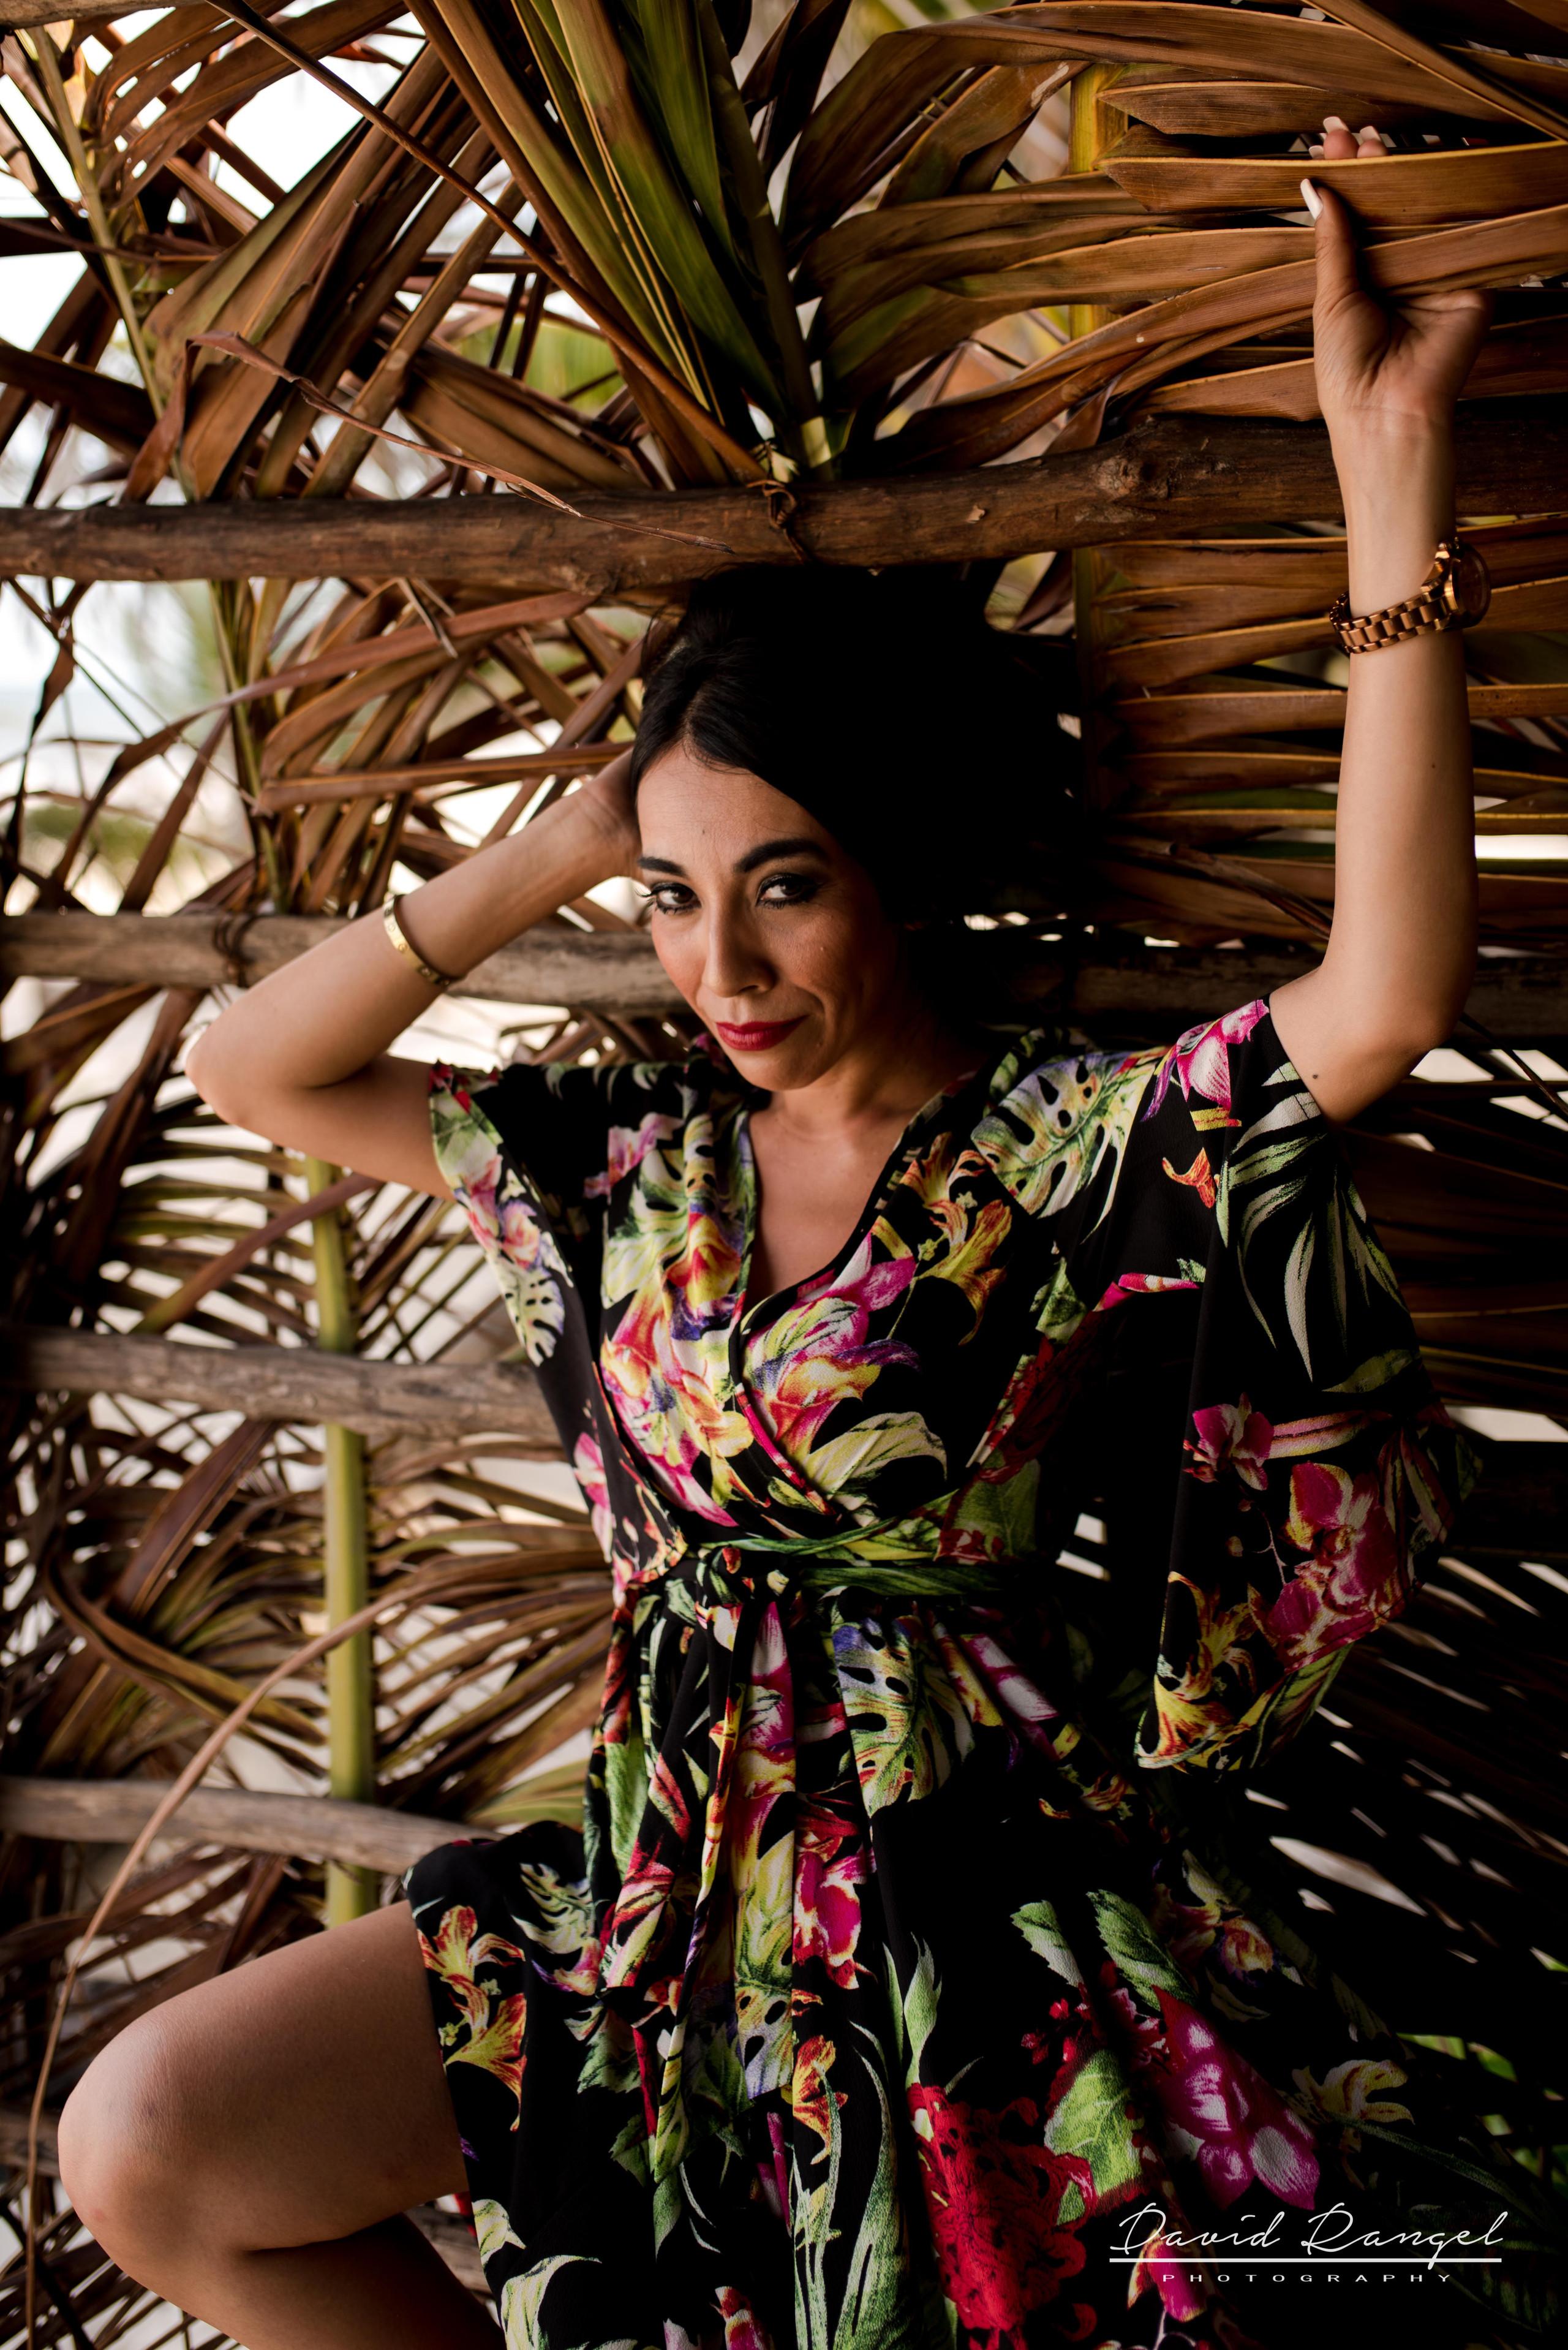 beach+photo+session+tulum+casa+malca+destination+photographer+garden+sand+riviera+maya+girl+woman+photo+picture+model+intimate+david+rangel+photography+photographymnm+tunnel